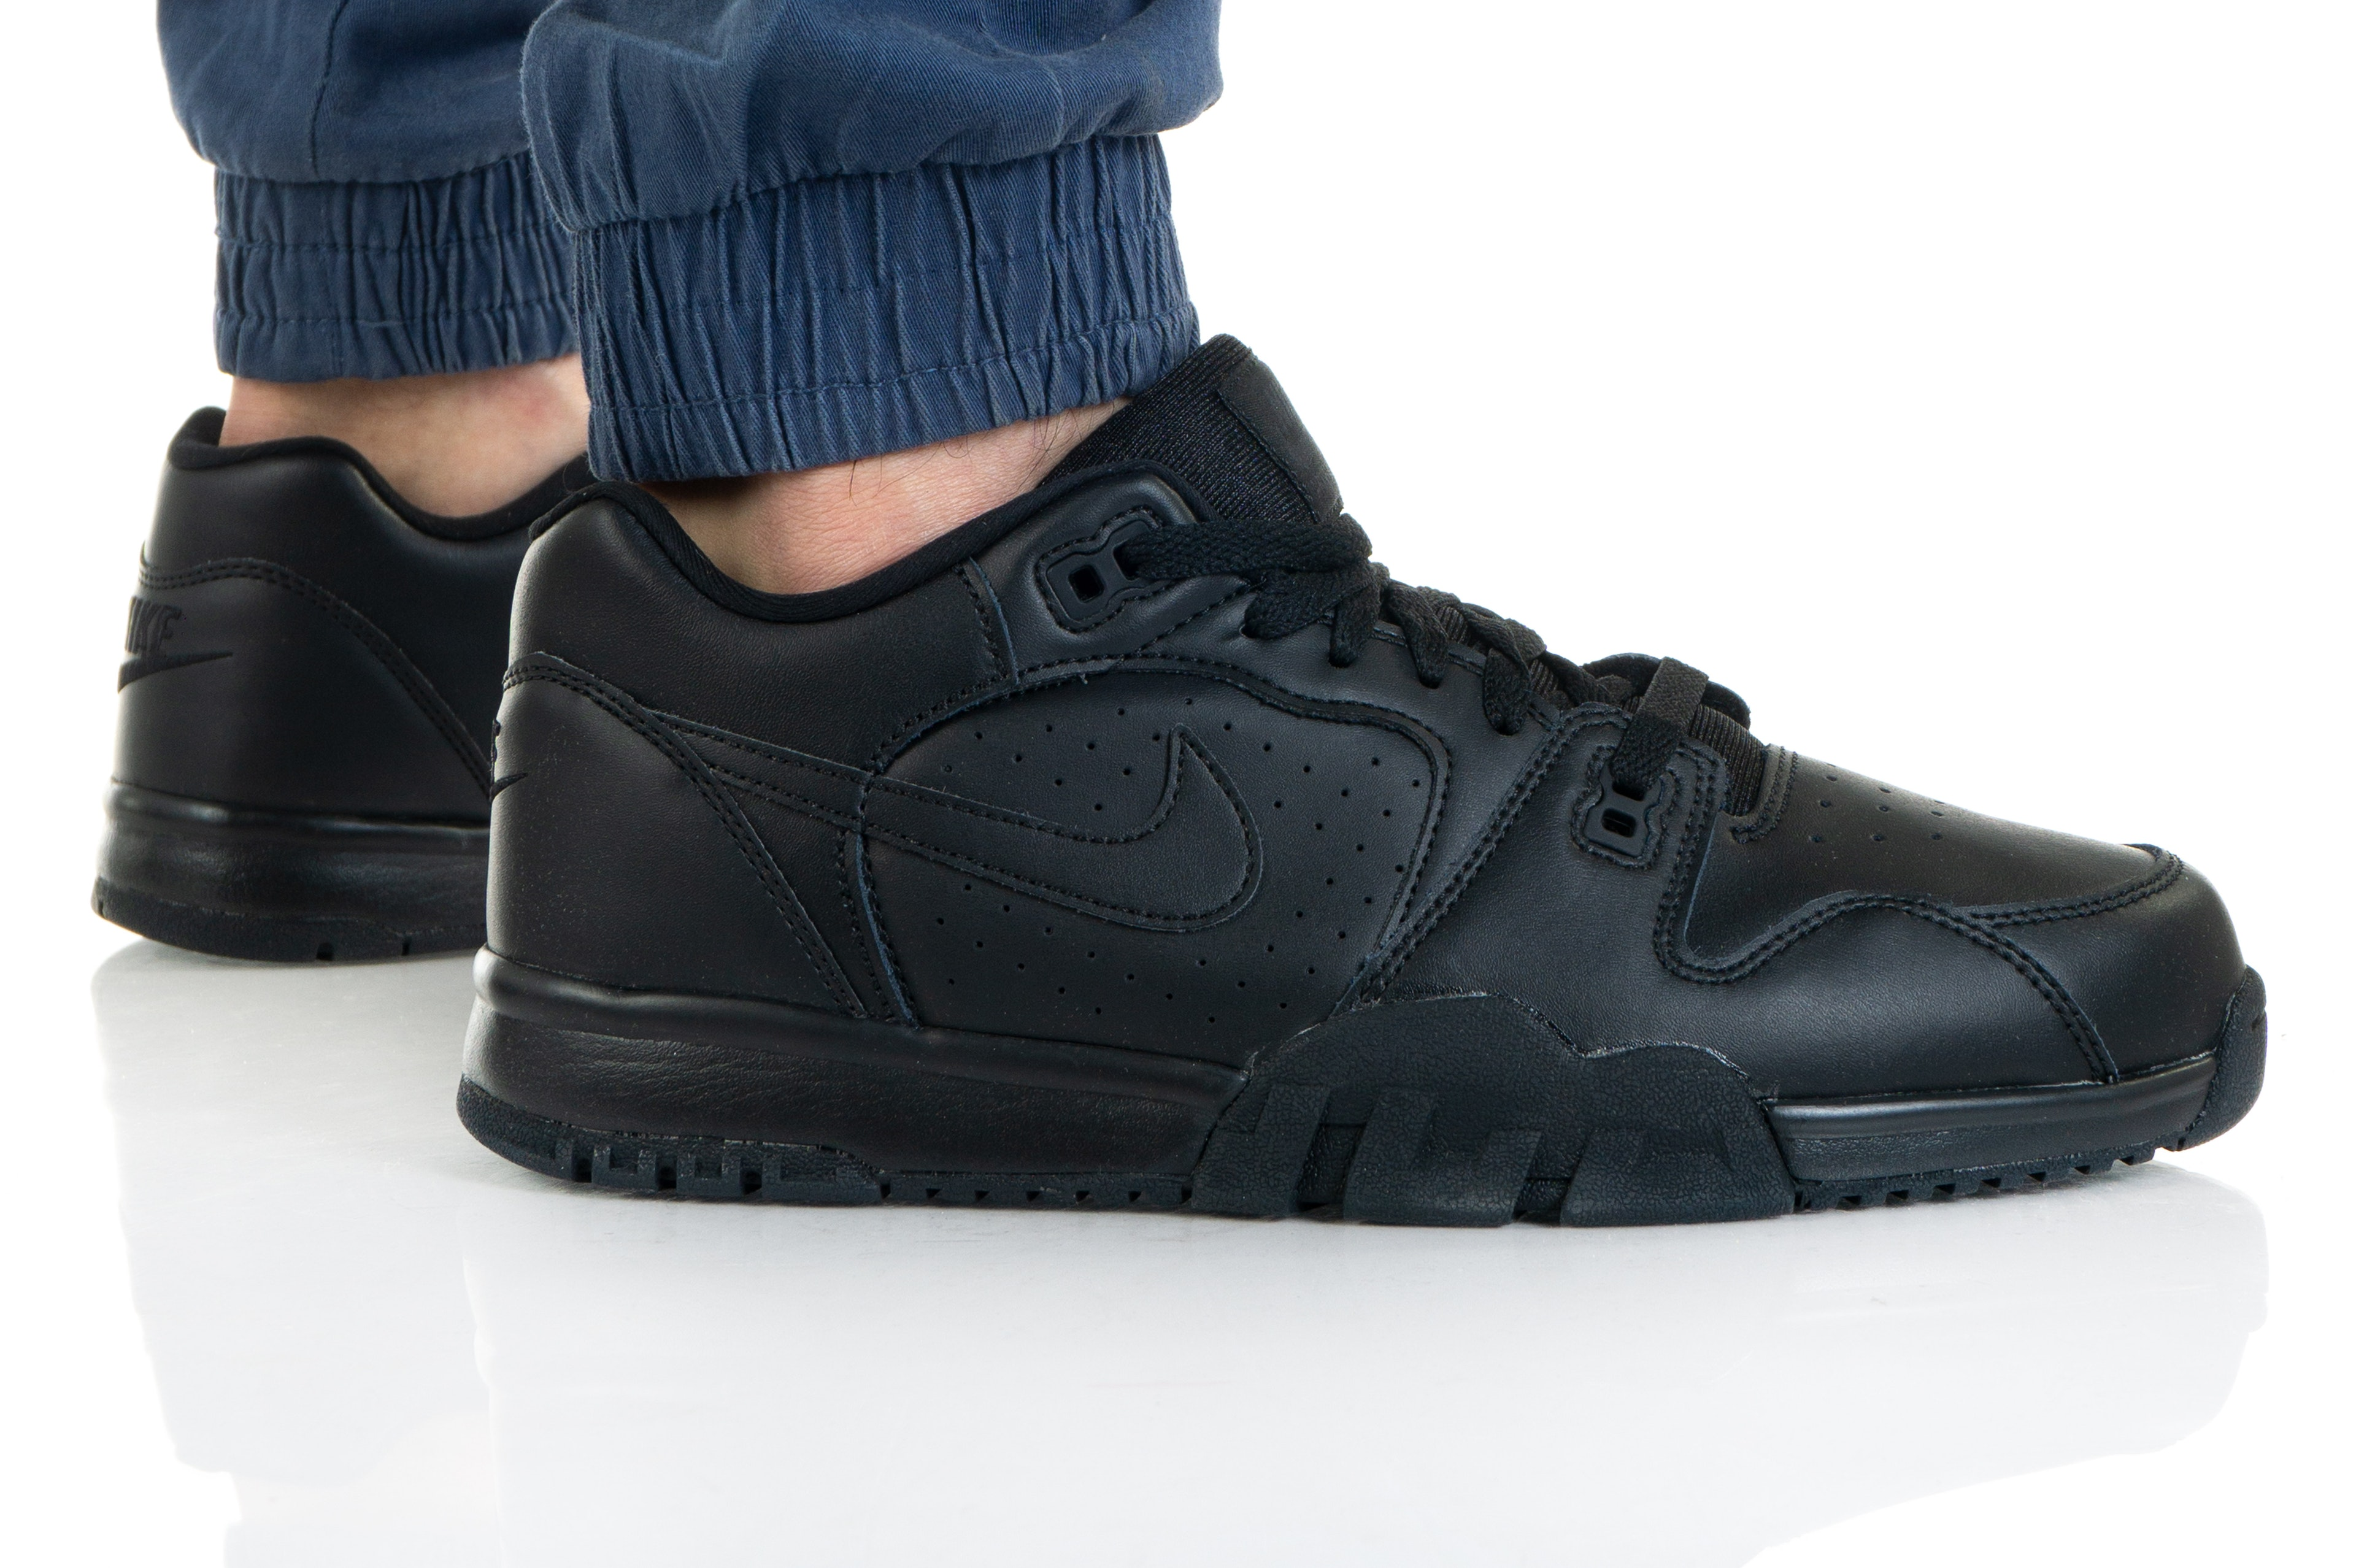 Nike CROSS TRAINER LOW CQ9182-001